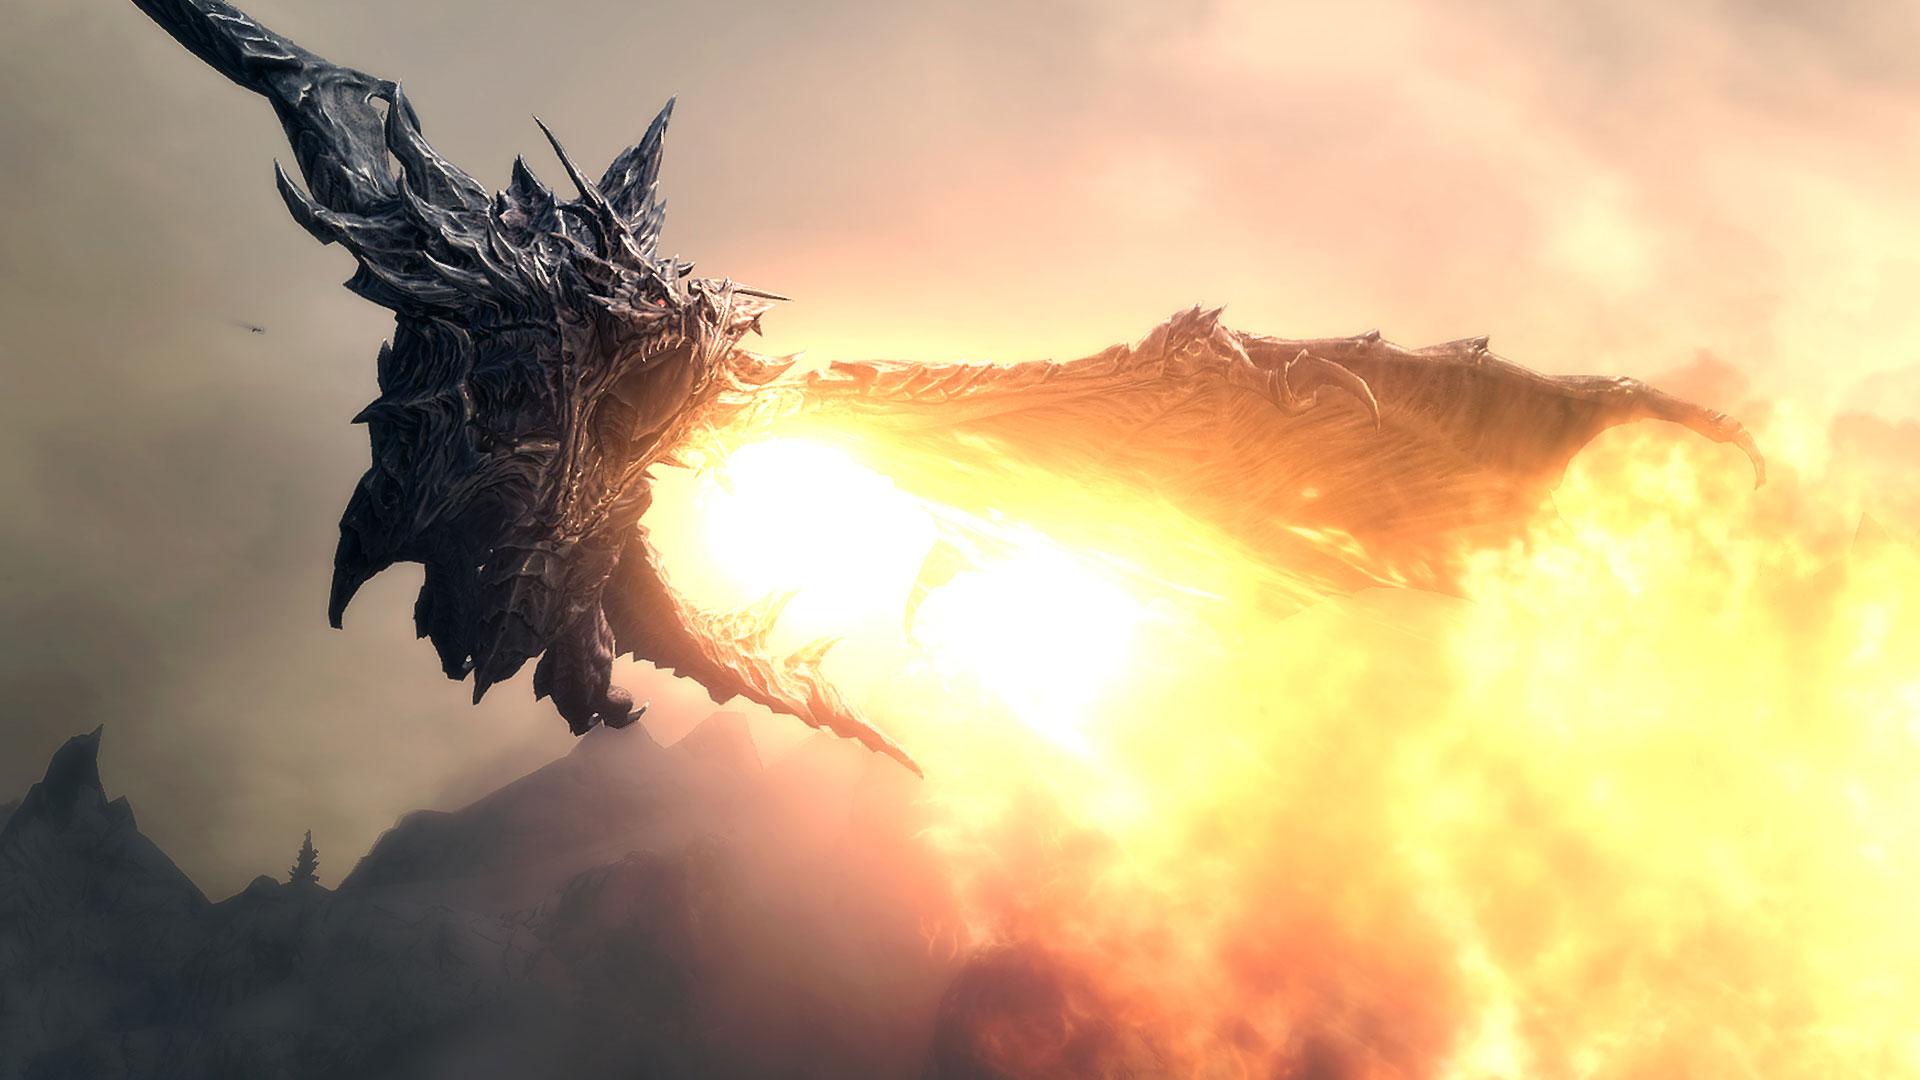 The elder scrolls v skyrim full hd wallpaper and background image video game the elder scrolls v skyrim skyrim dragon wallpaper voltagebd Choice Image